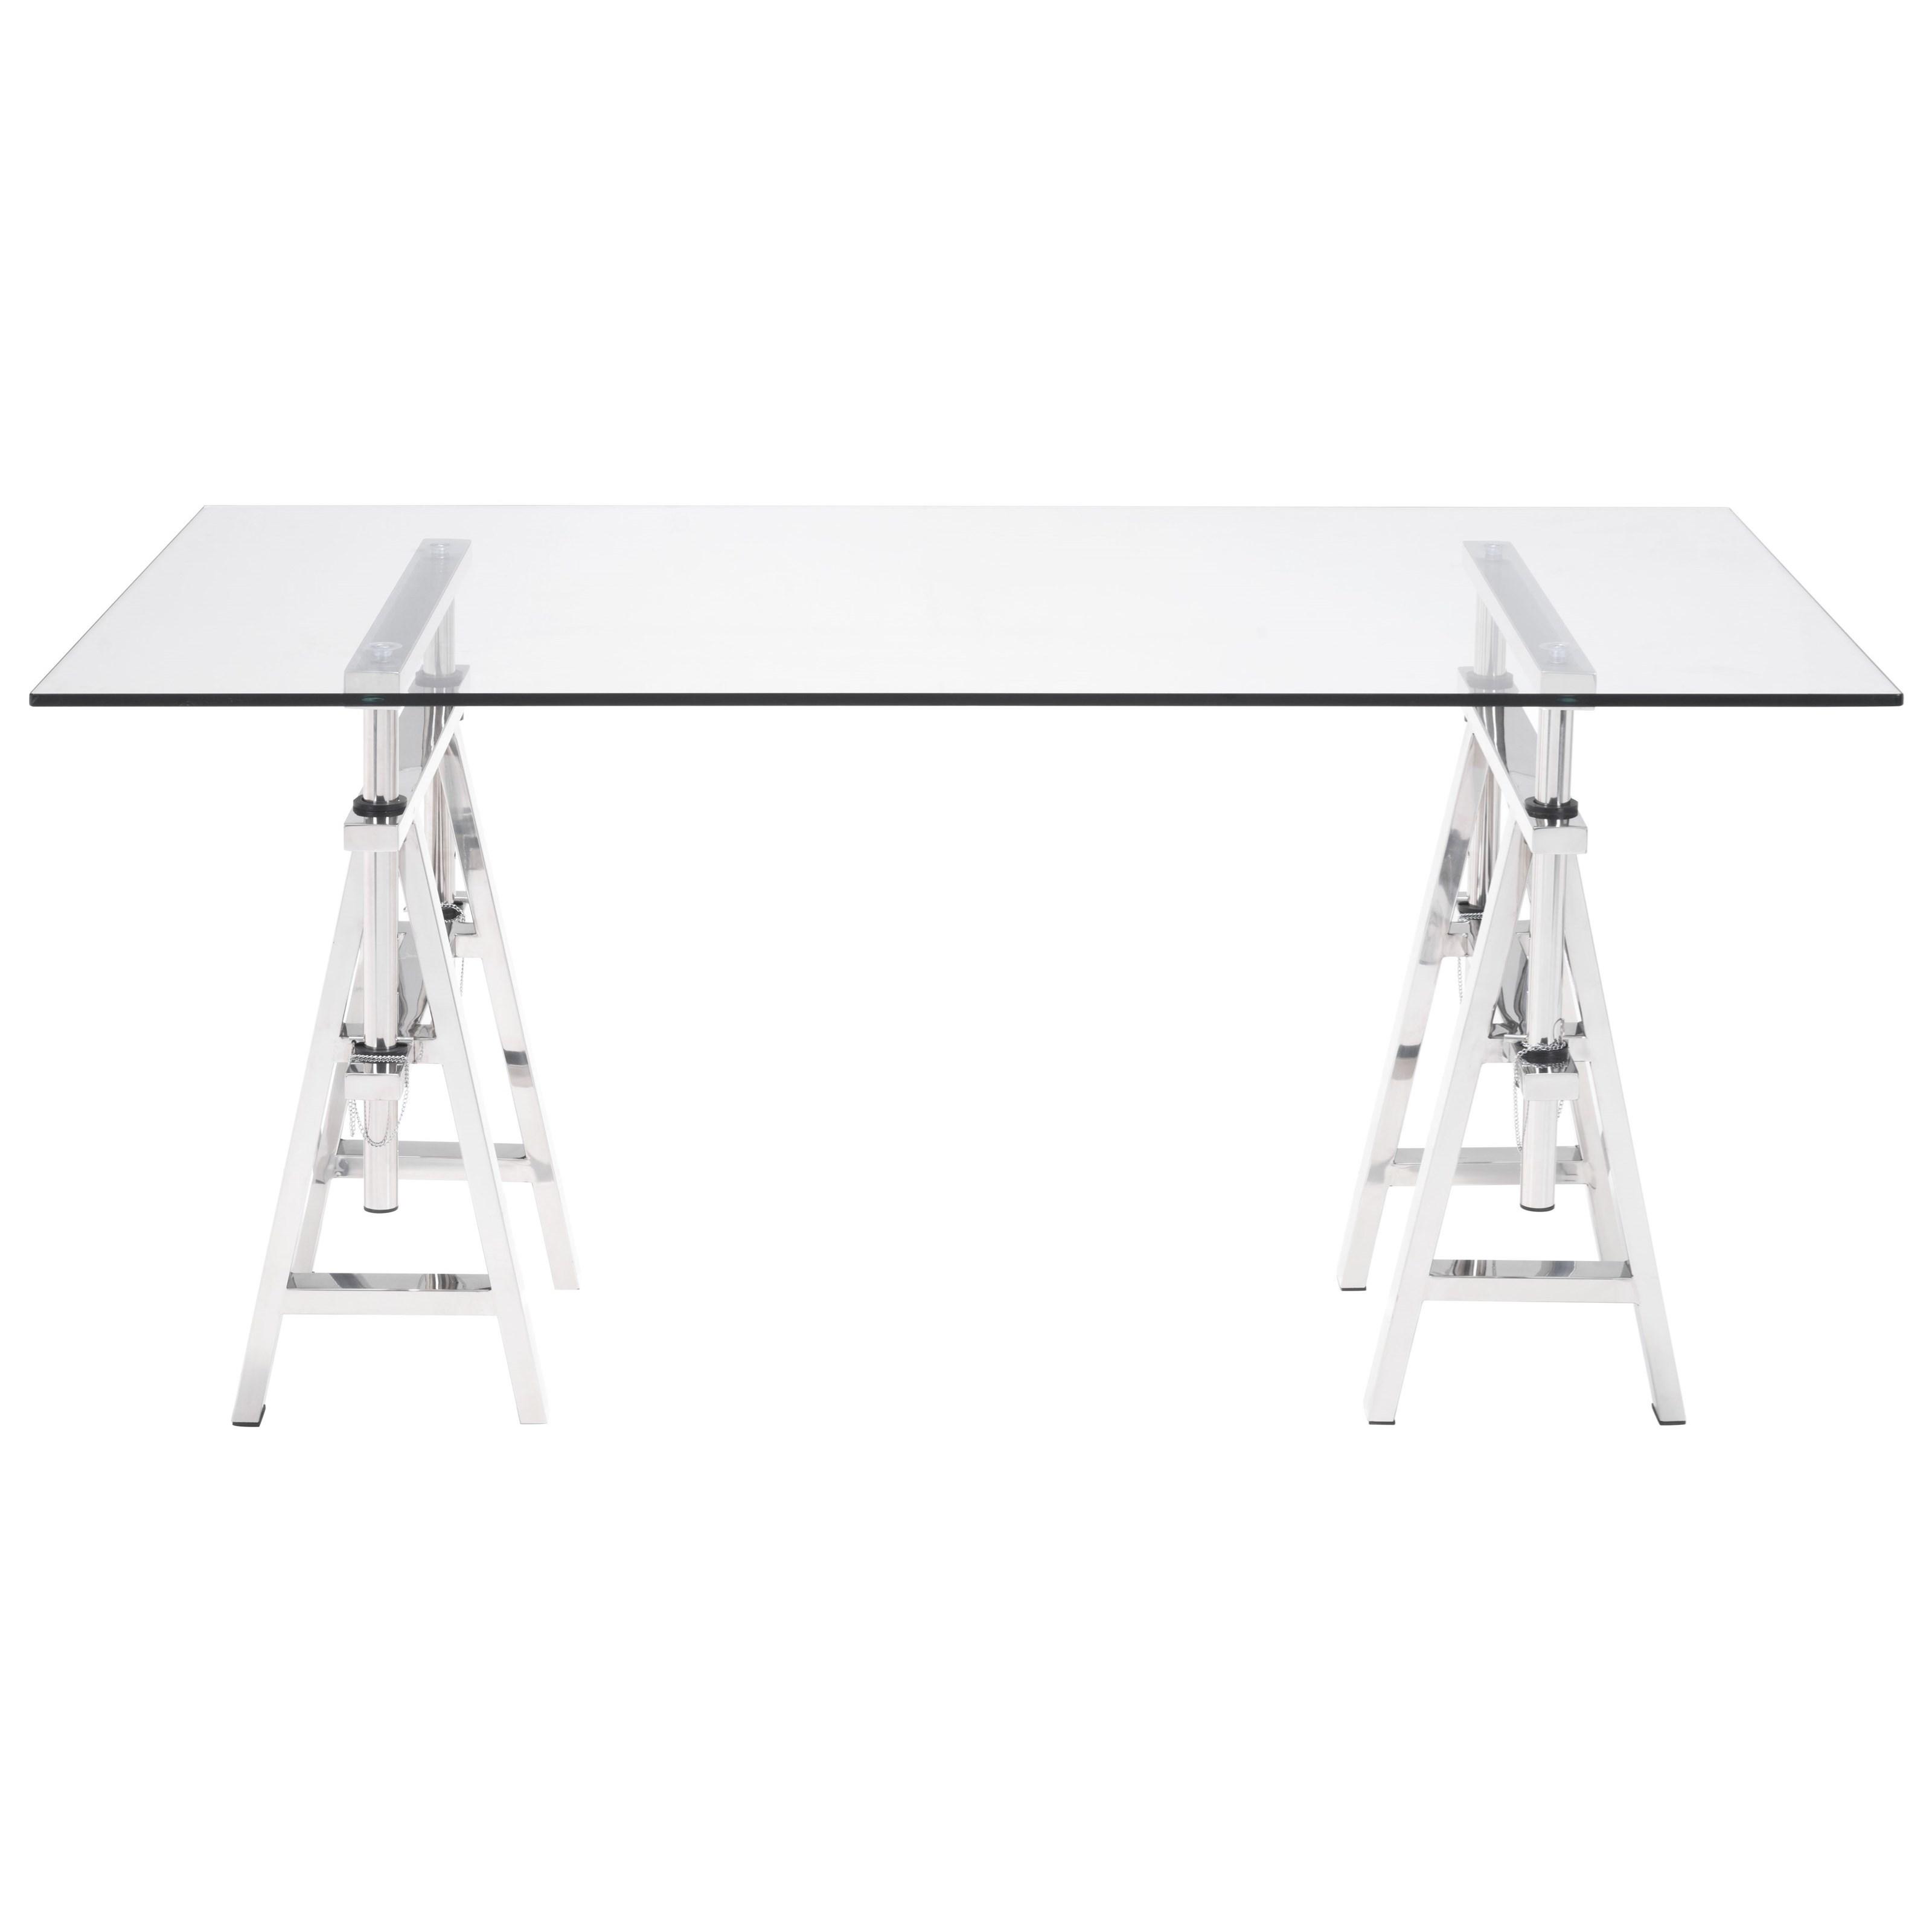 Lado Chrome Desk by Zuo at Nassau Furniture and Mattress